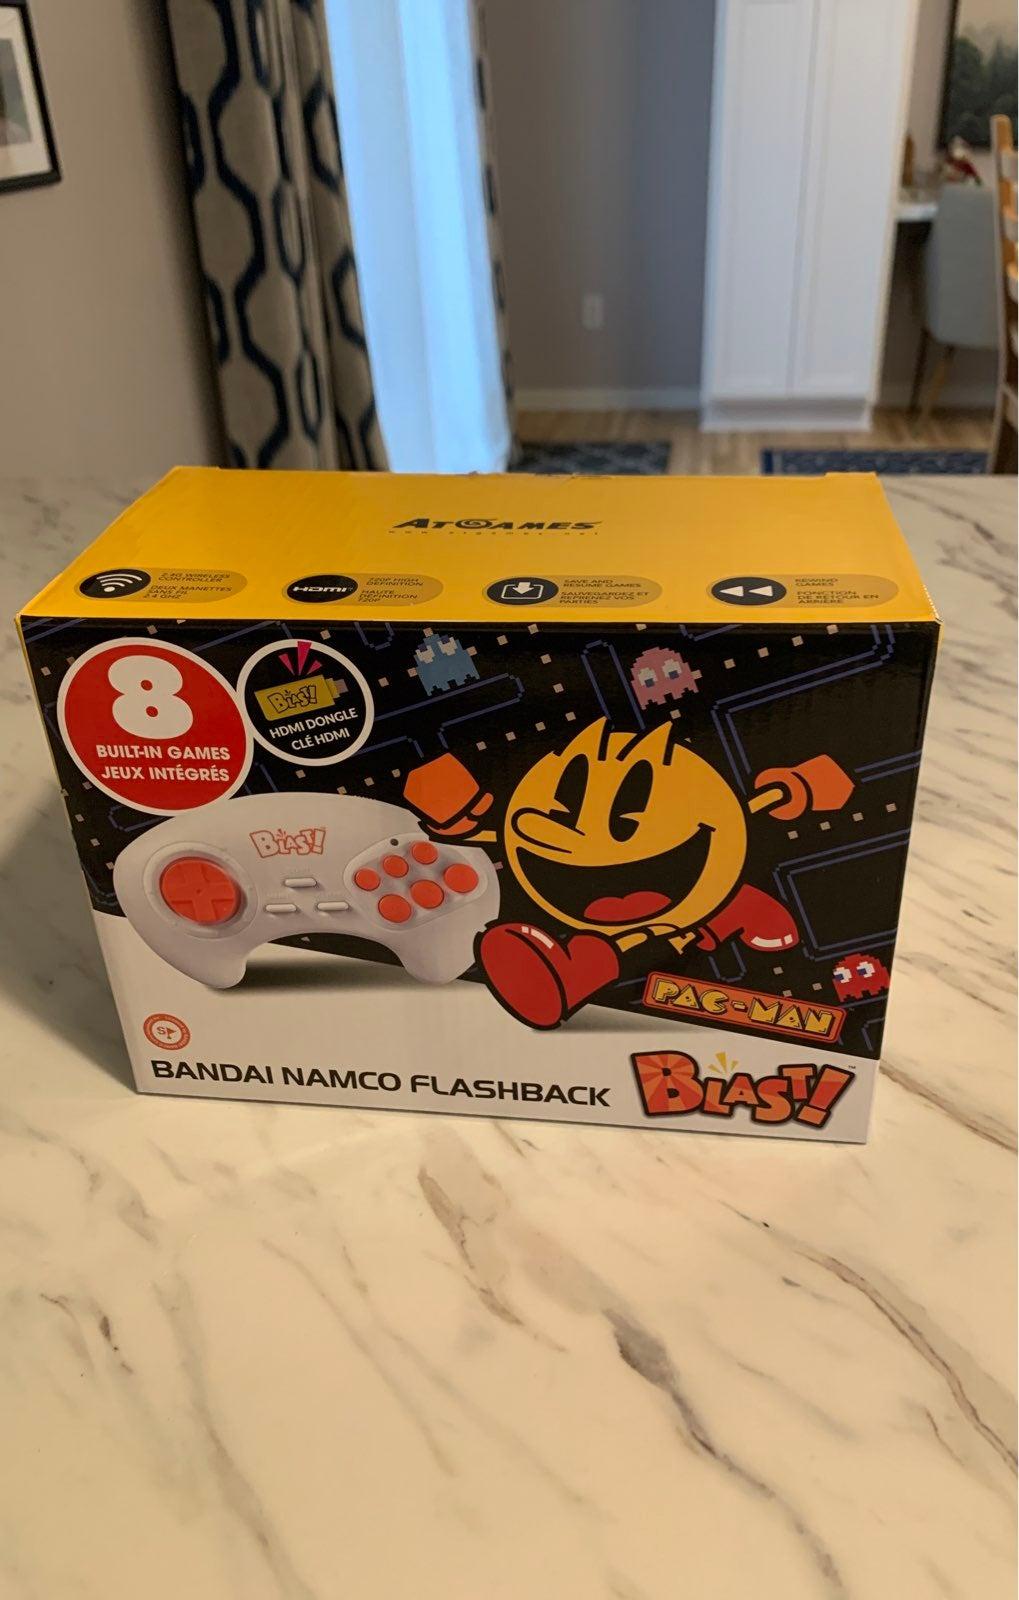 Bandai Namco Flashback Blast